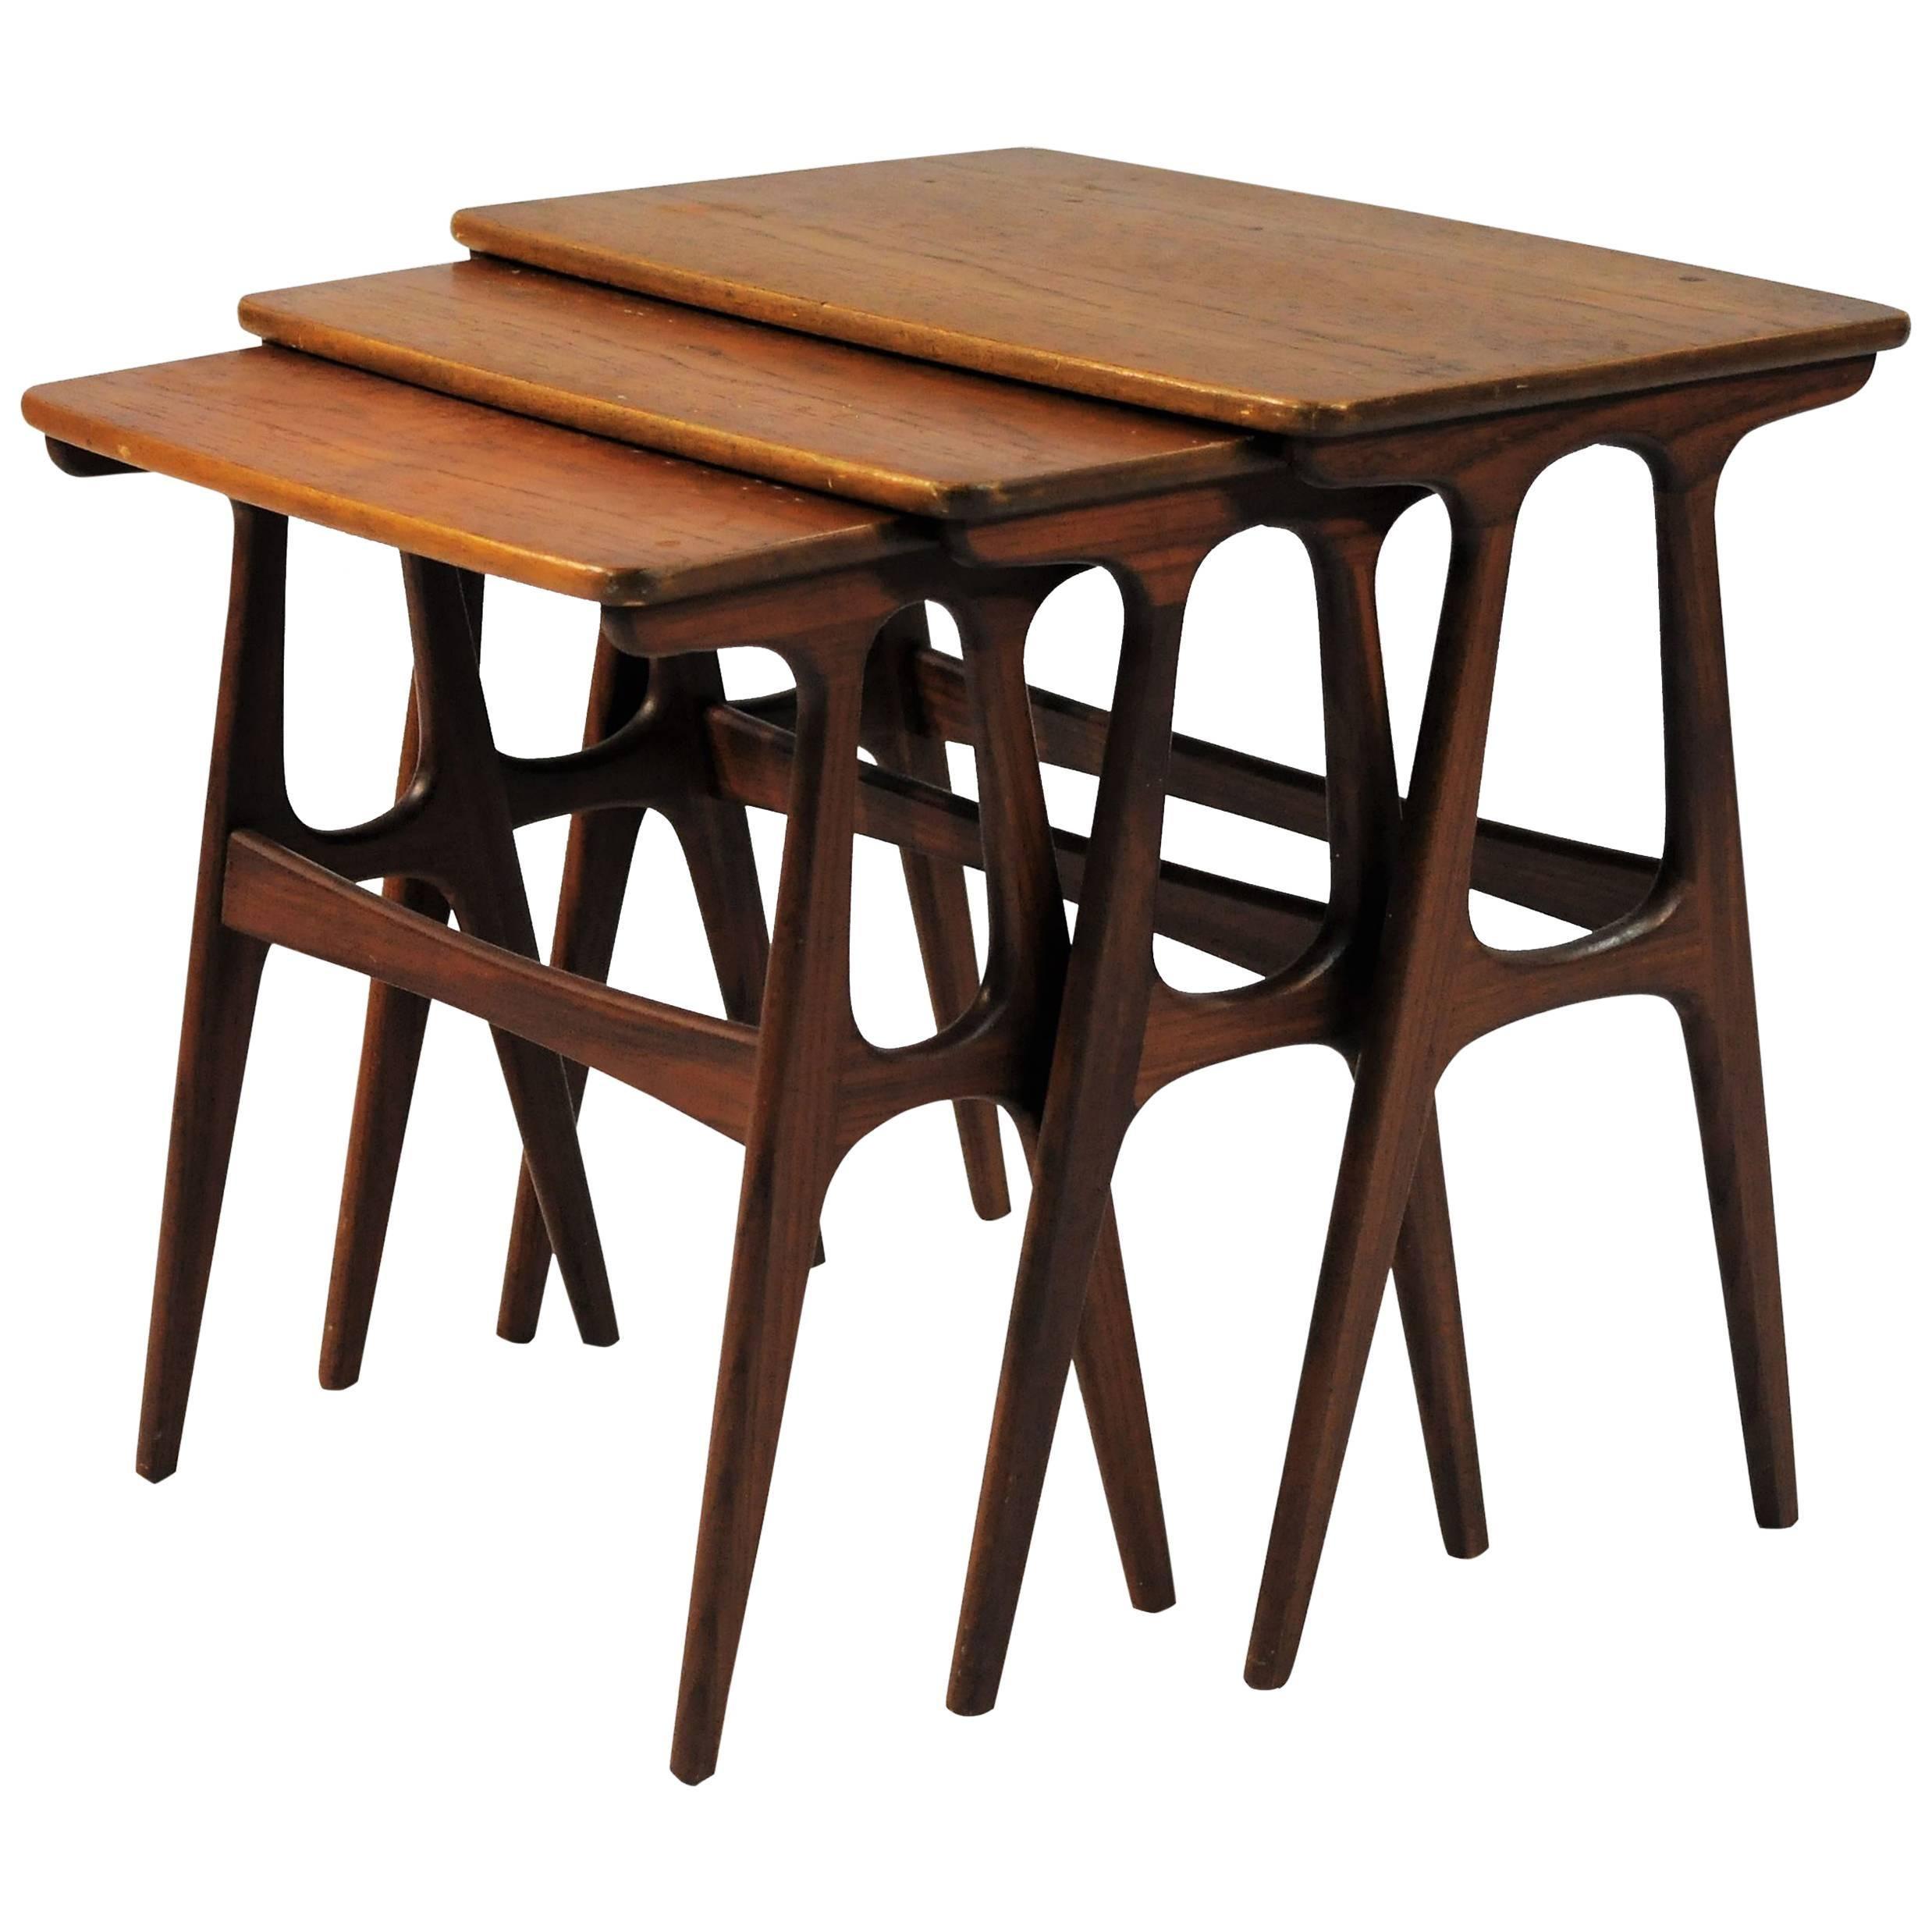 1960s Set of Danish Nesting Tables in Teak